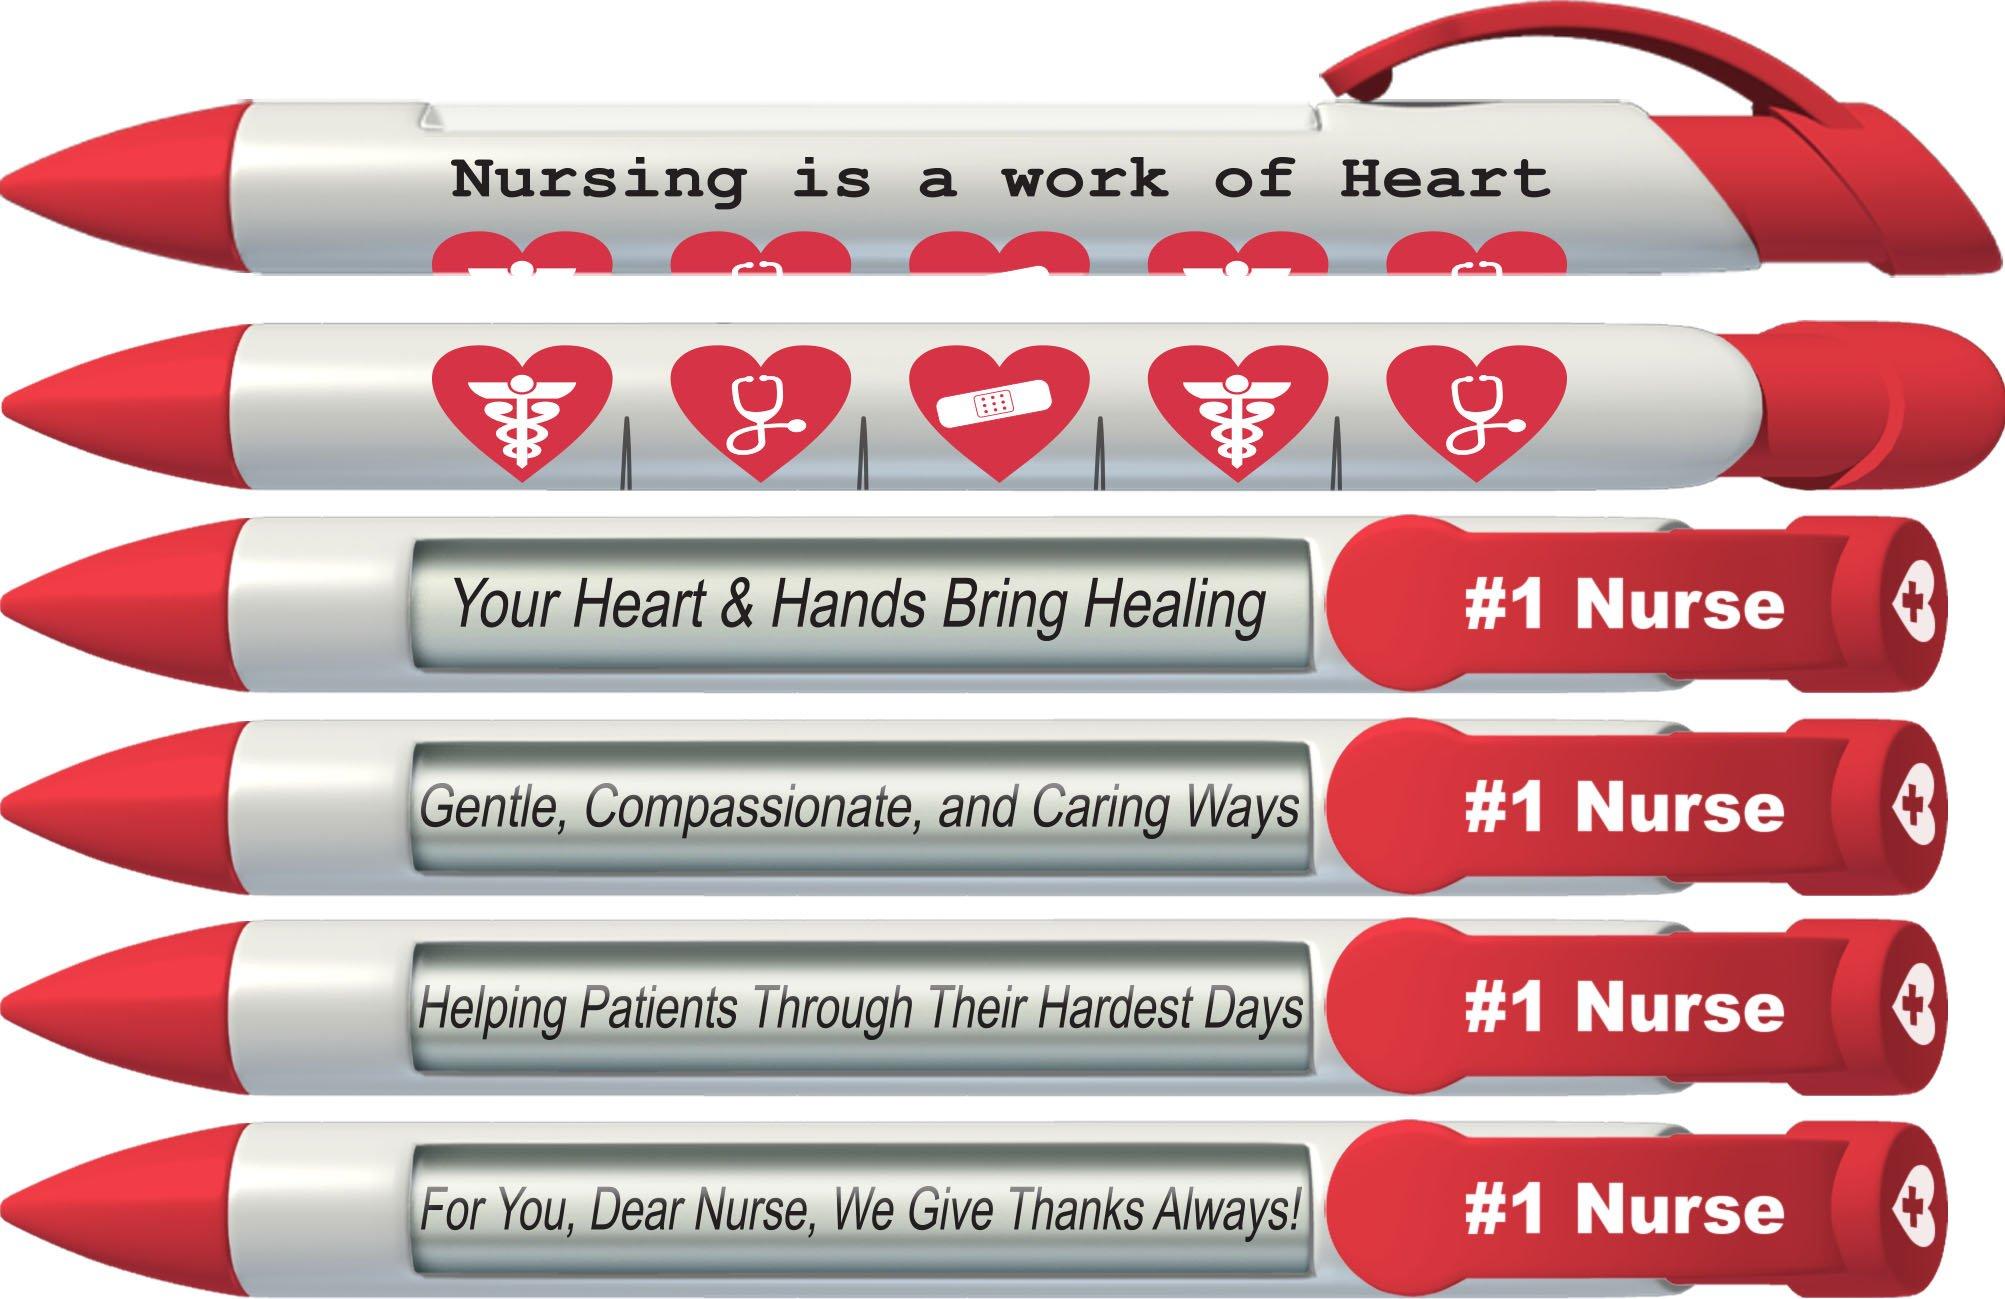 Amazon Greeting Pennurses Have Heart 1 Nurse Pens With